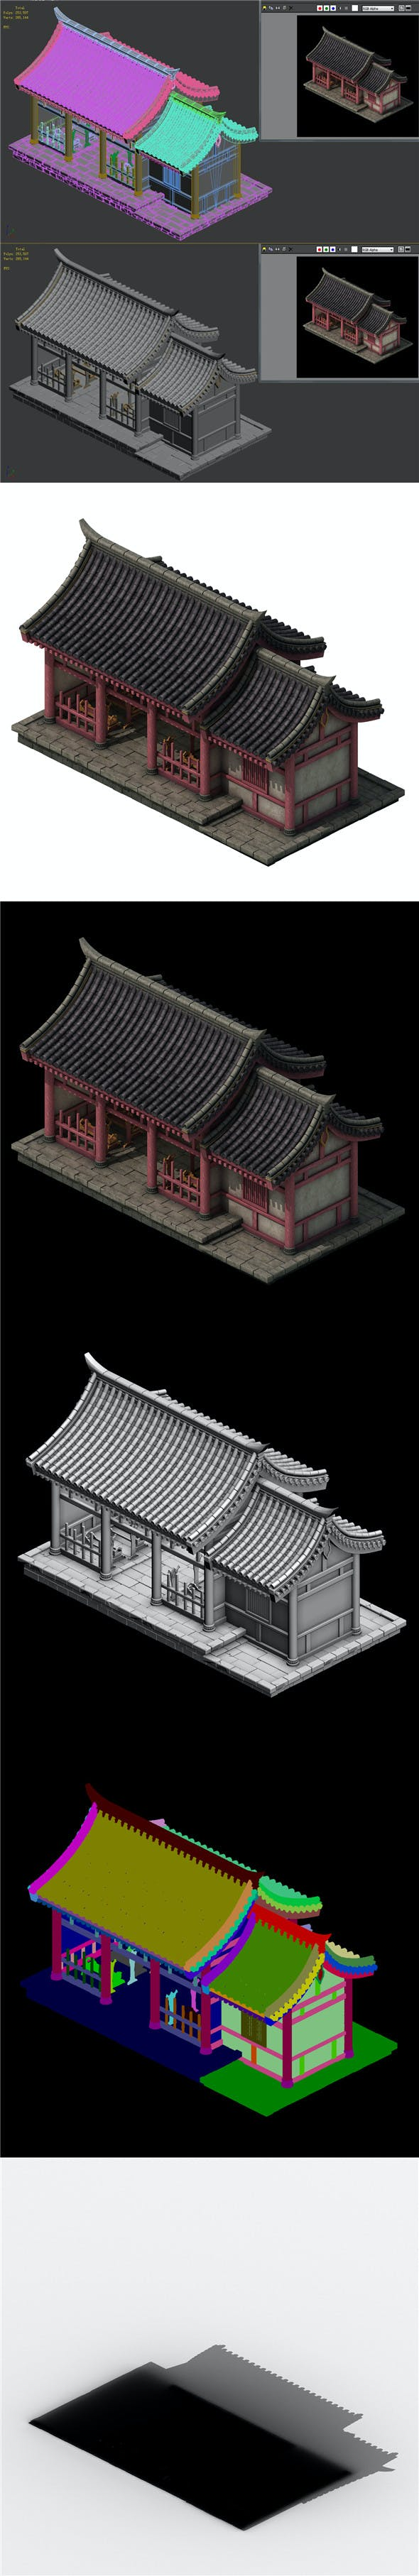 City Building - Courtroom 03 - 3DOcean Item for Sale